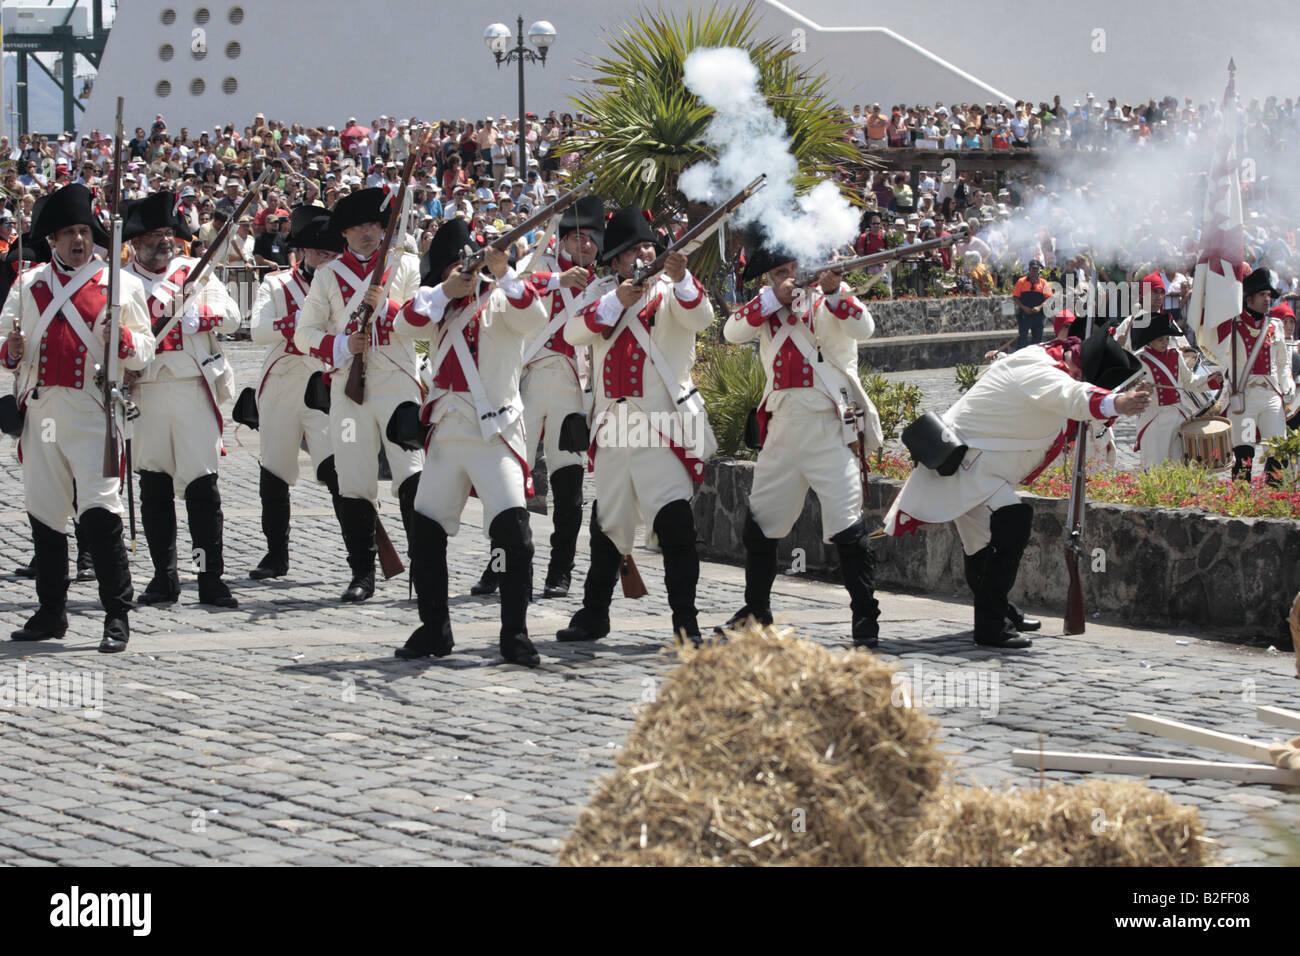 The Batallon de Canarias prepare to charge during a reenactment of the 1797 battle of Santa Cruz, Tenerife Stock Photo